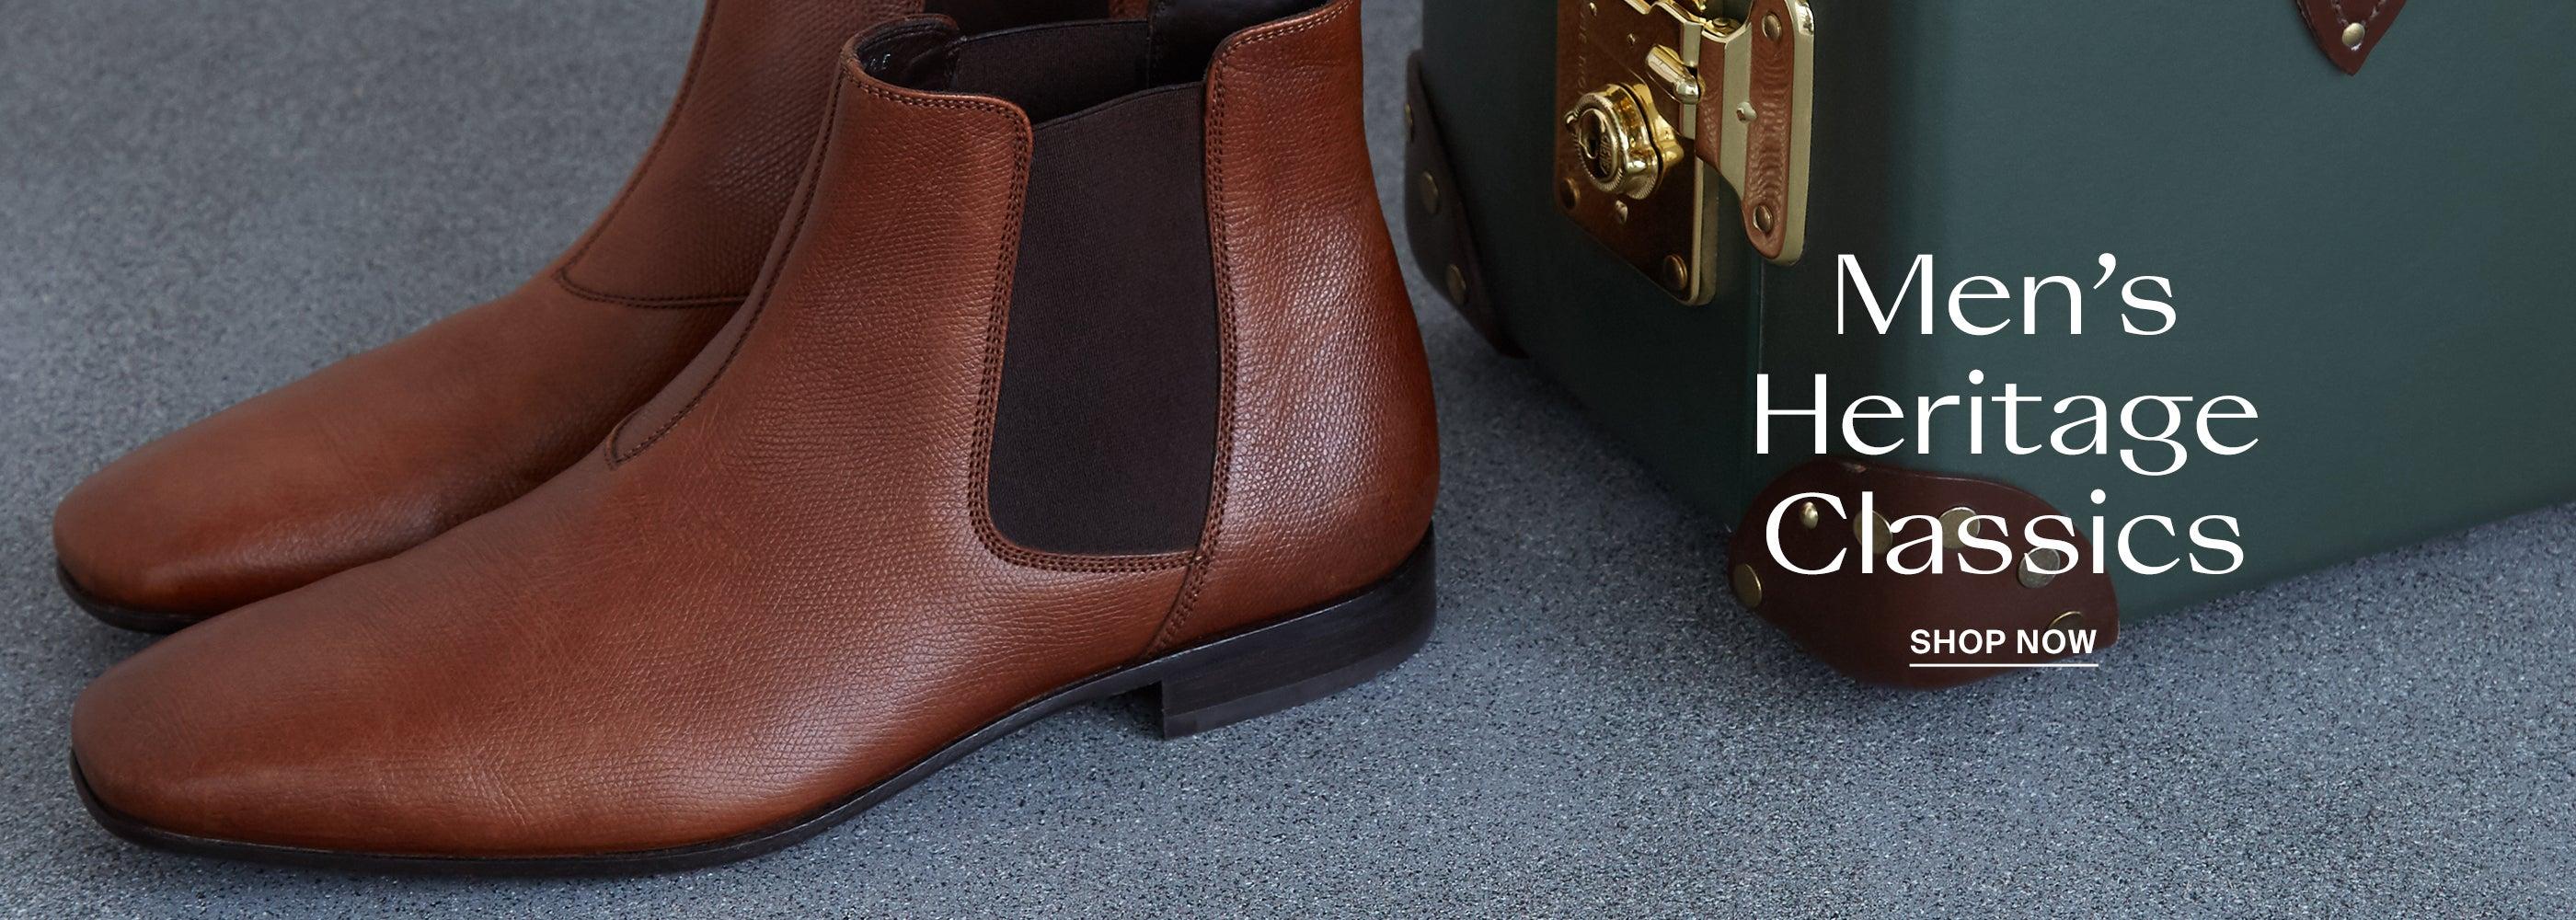 7b46c70d861e04 Luxury consignment sales. Shop for pre-owned designer handbags ...